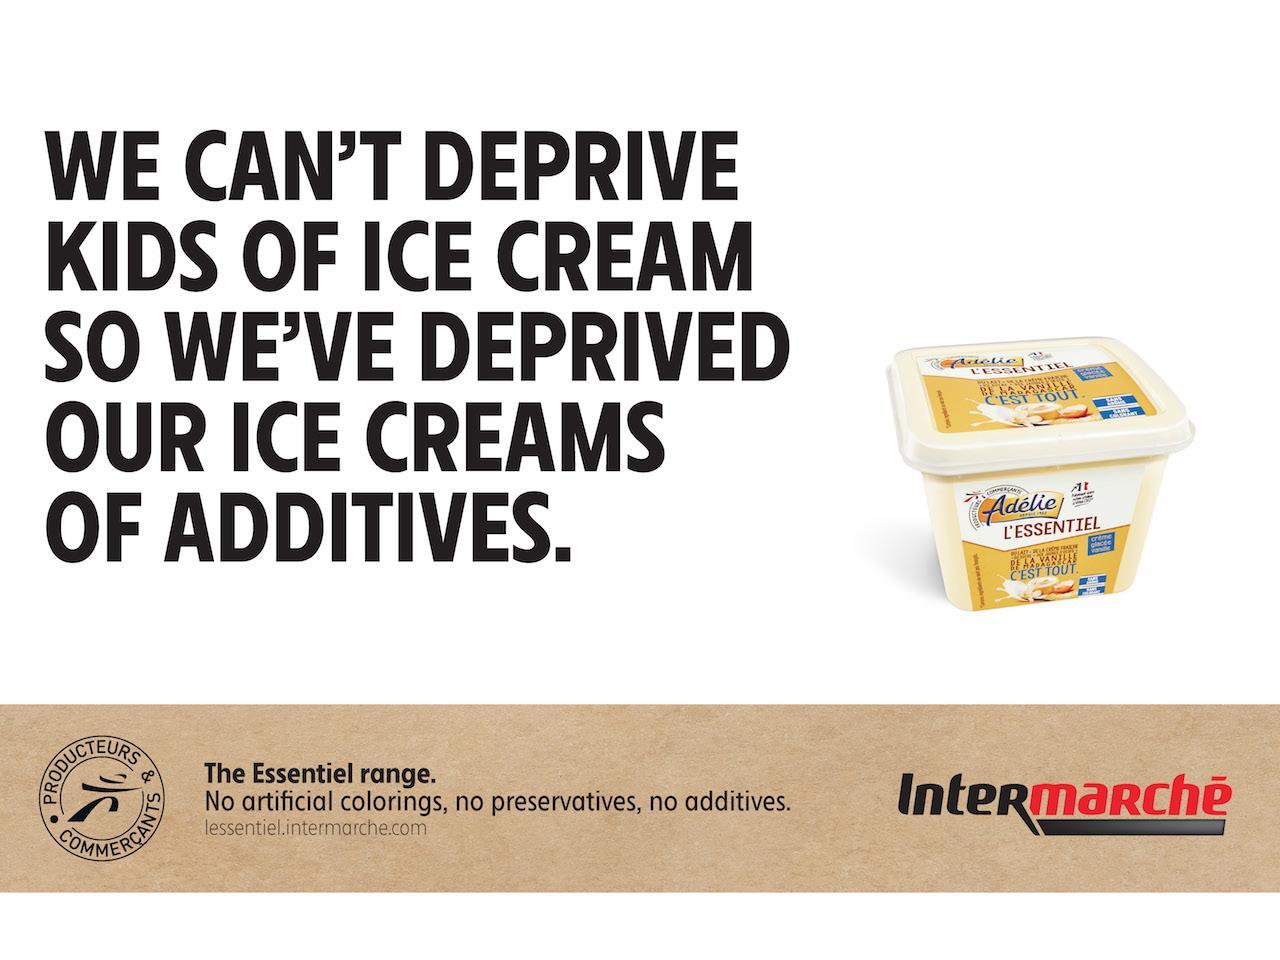 Intermarche Print Ad - The Taste of Colors, 2